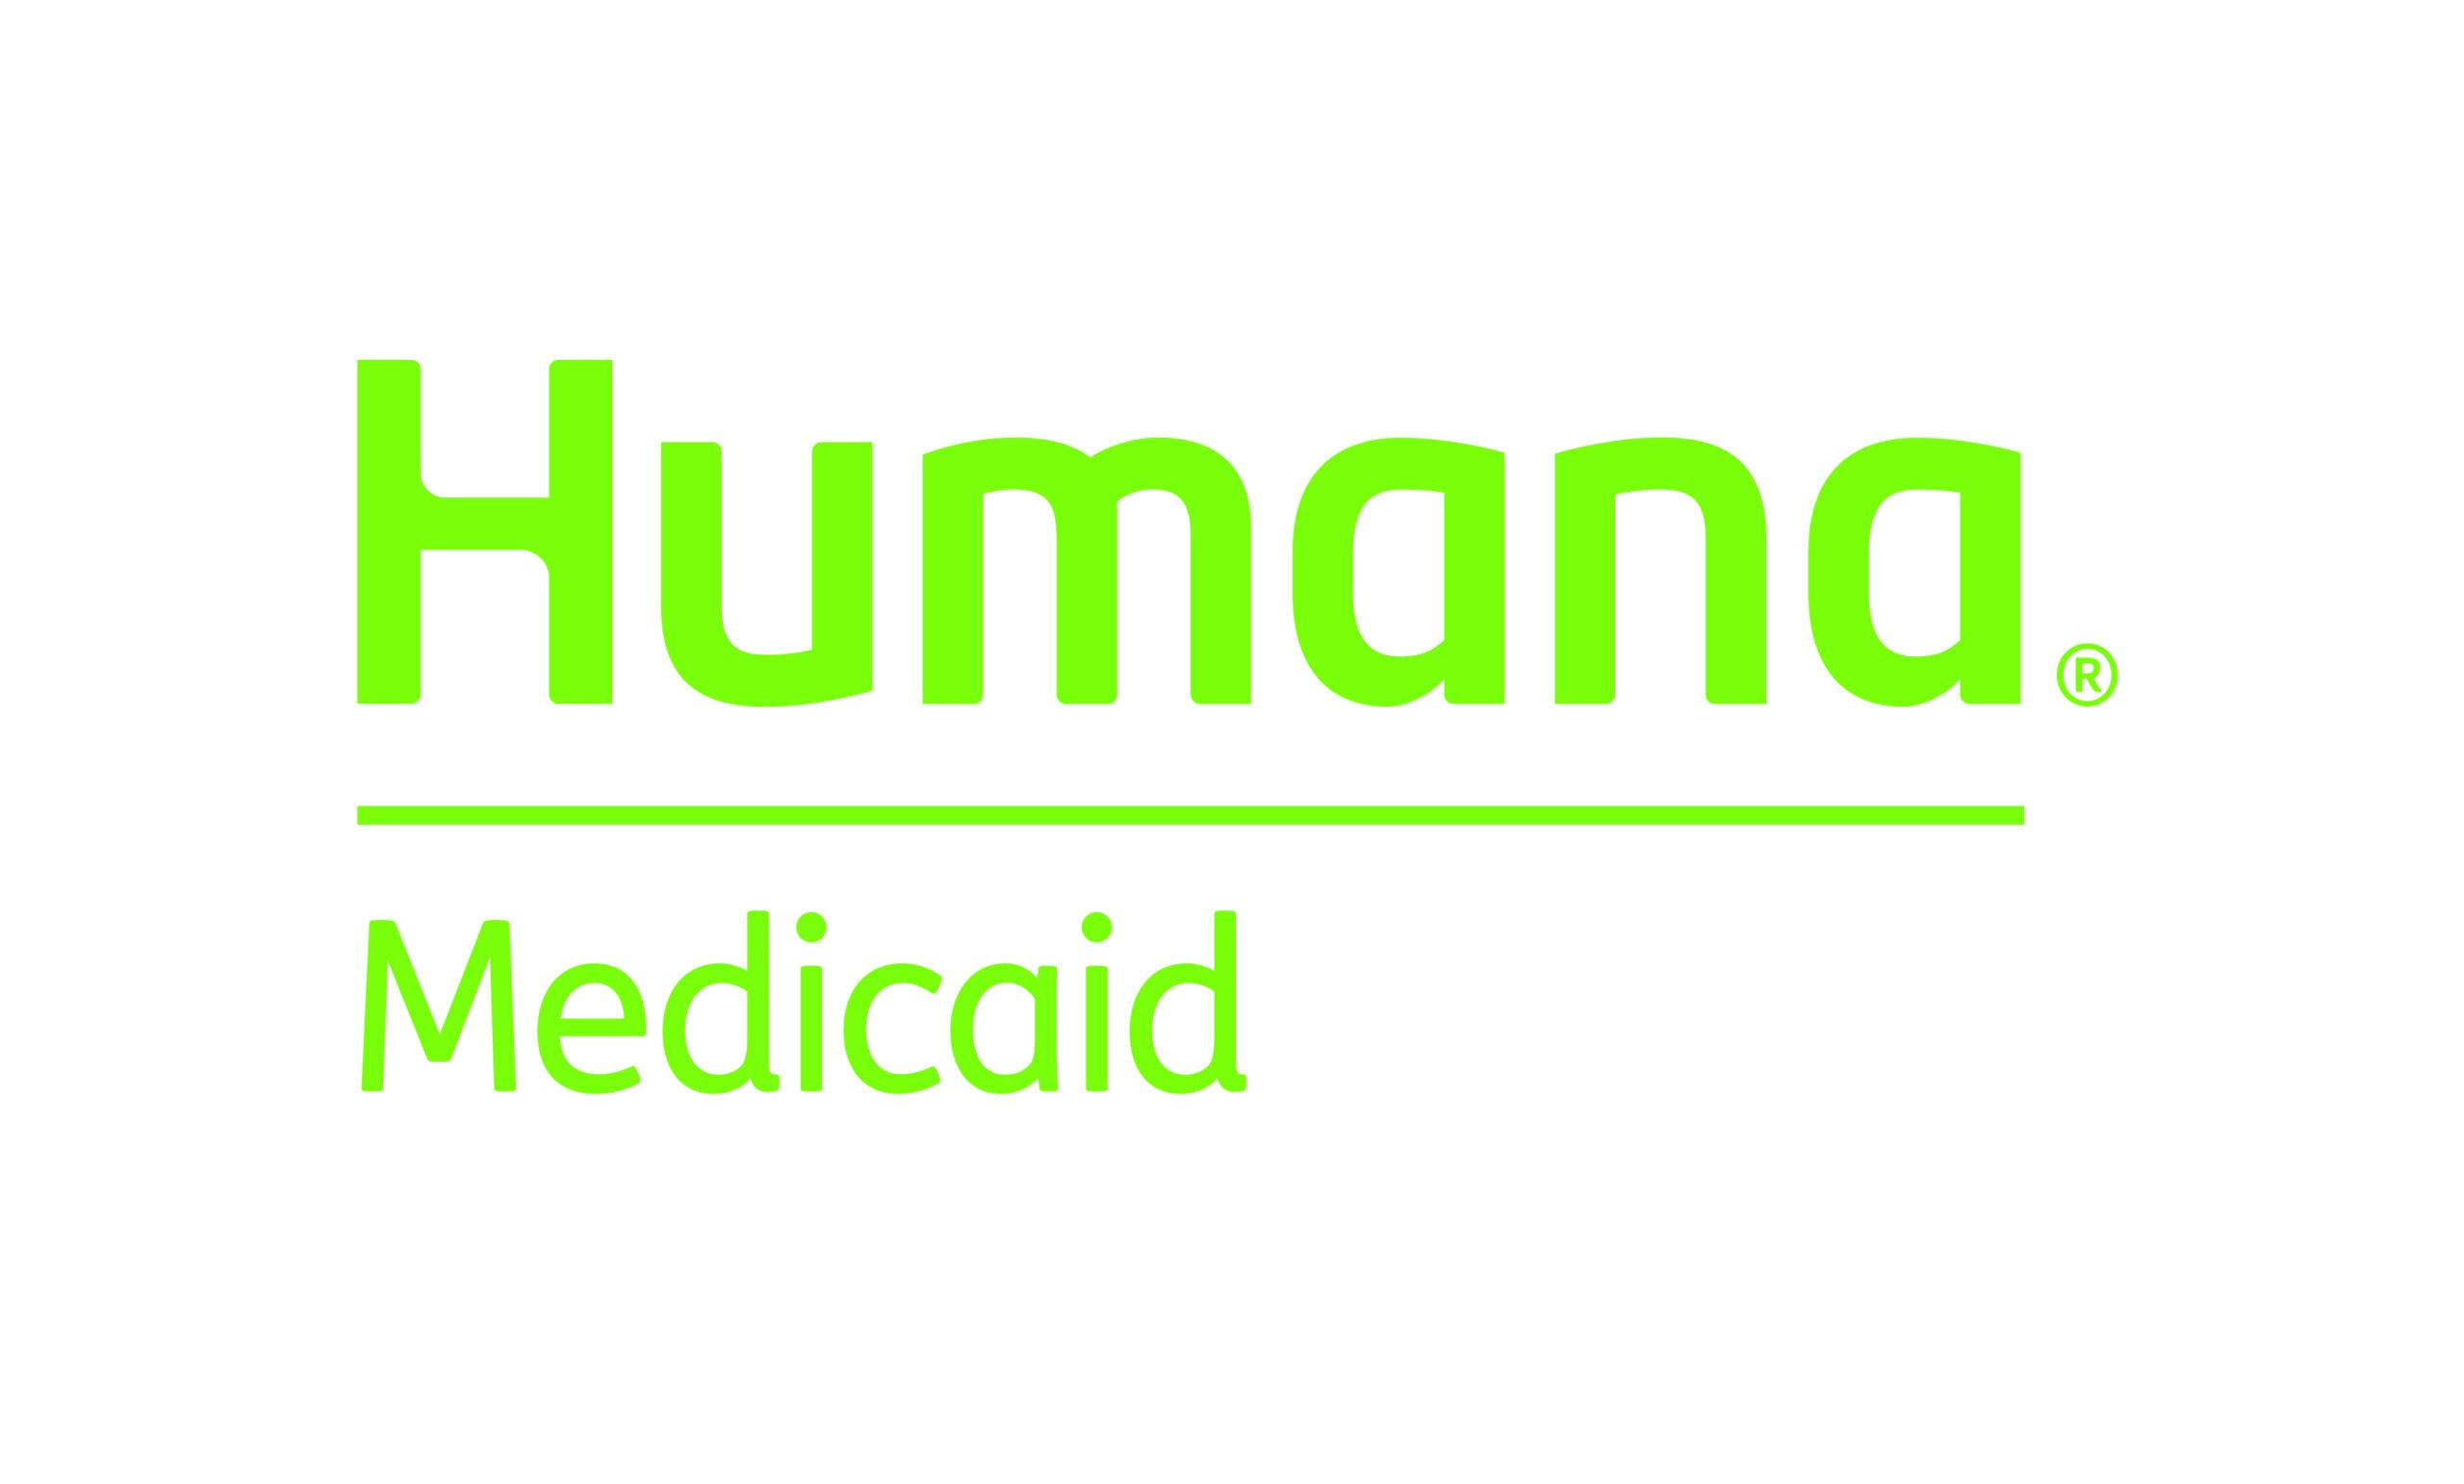 Humana Medicaid